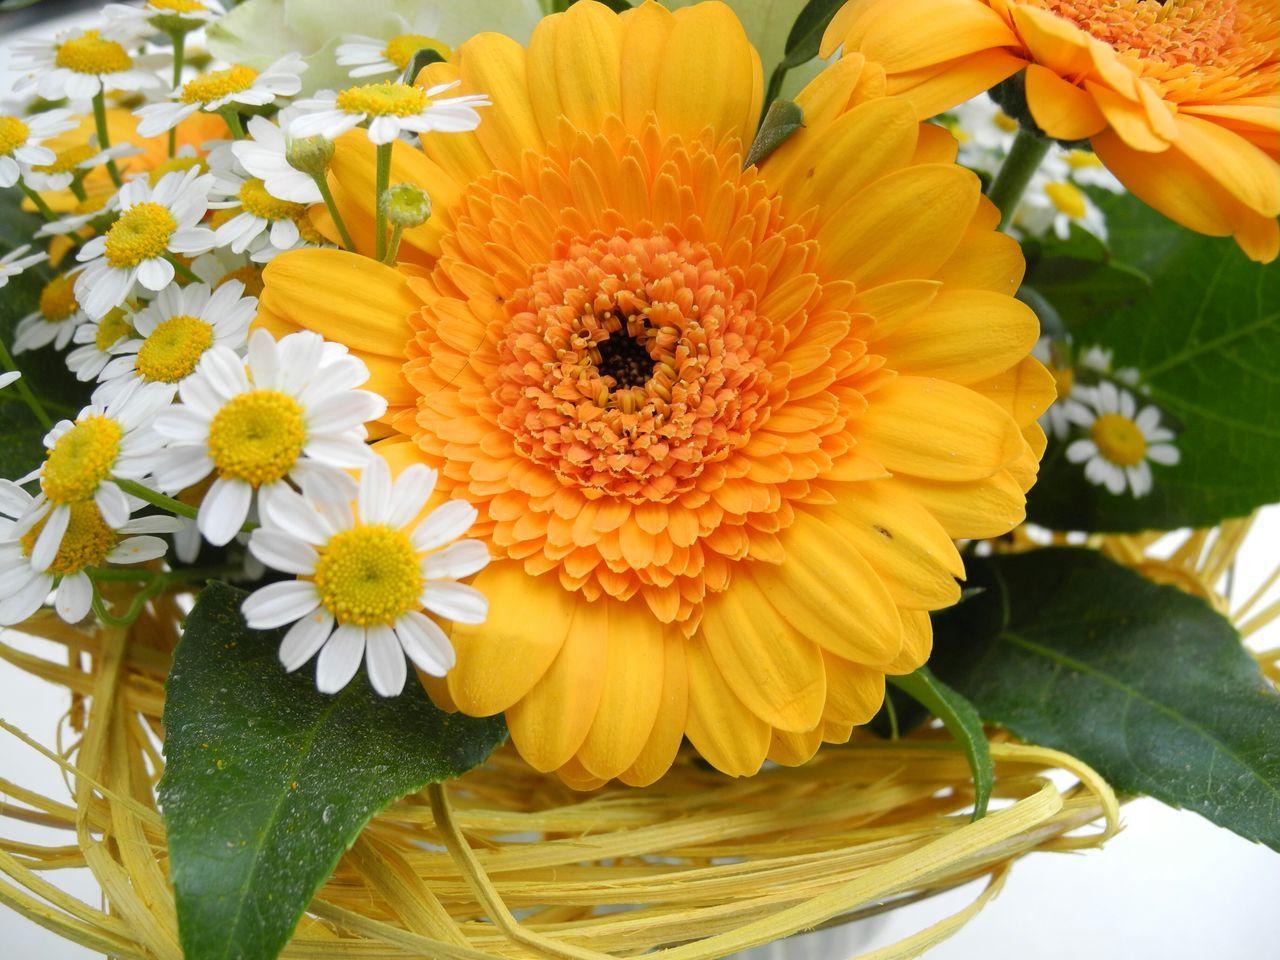 Flower Collection Bouquet Of Flowers Birthday Flowers Bouquet Flower Photography EyeEm Best Shots - Flowers Flower Bouquet